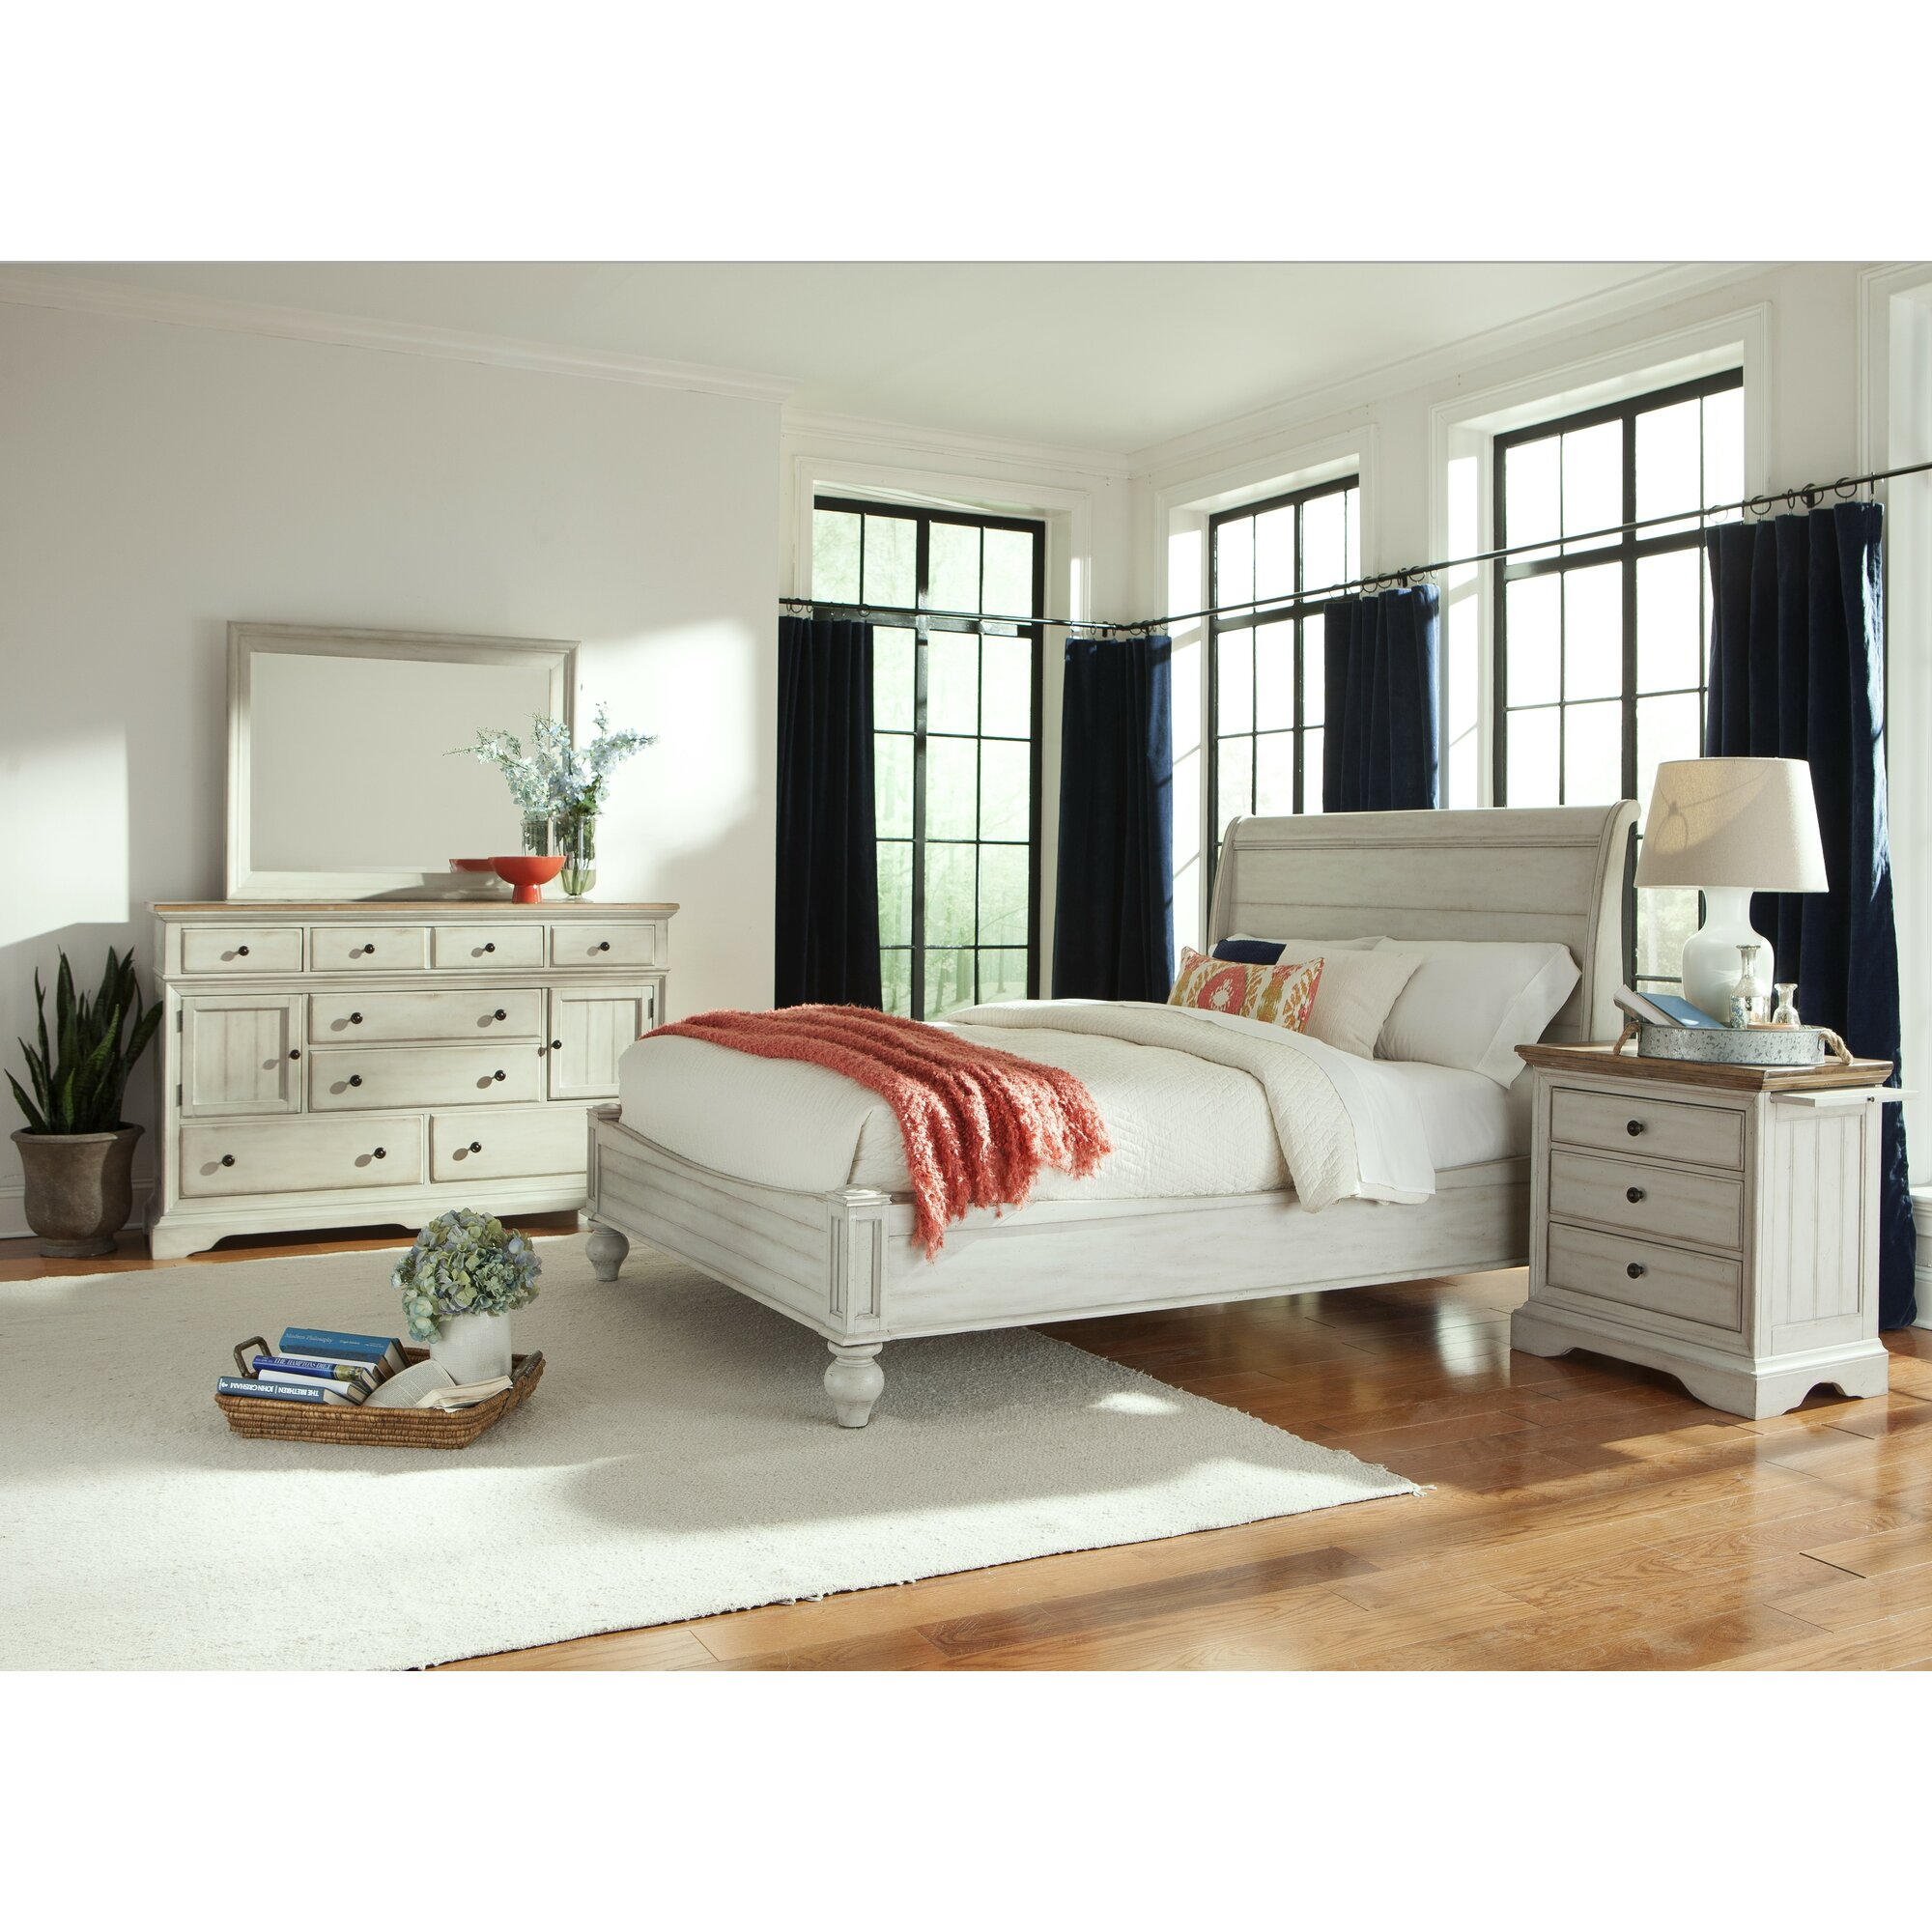 Cottage Panel Customizable Bedroom Set